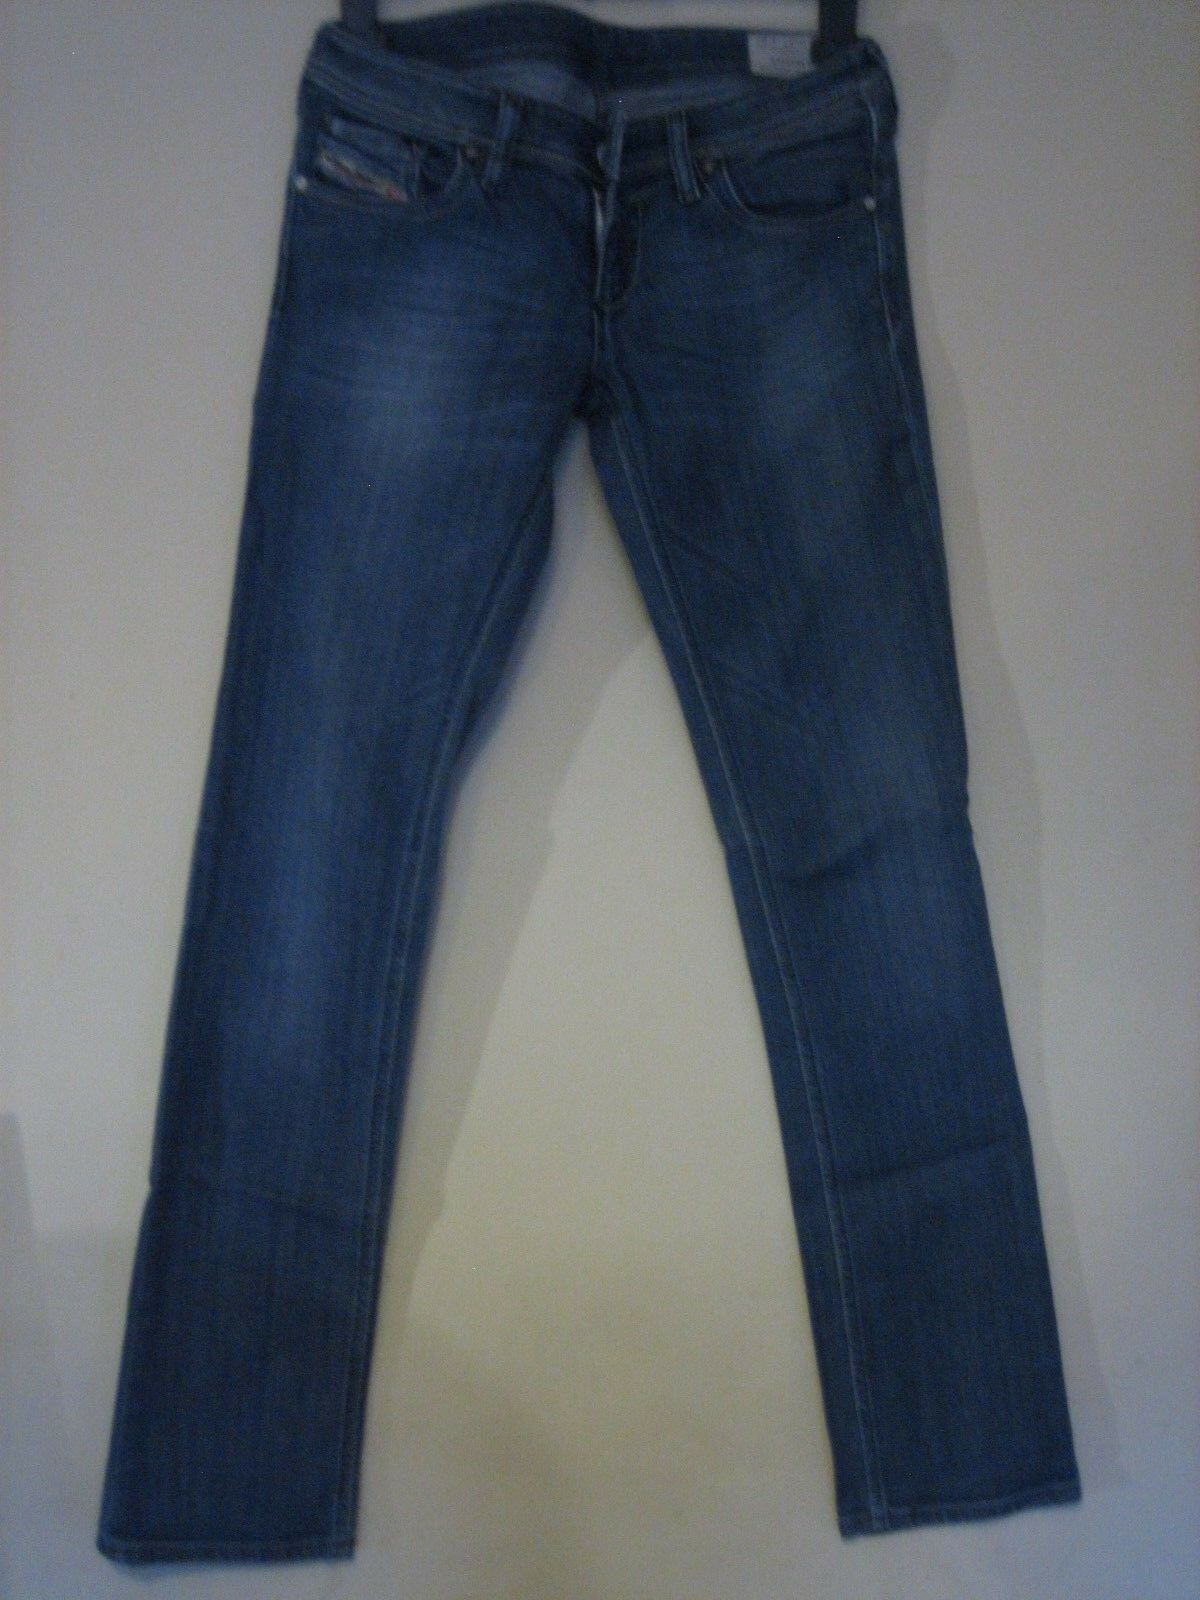 2 PX) WOMENS DIESEL blueE LOWKY STRETCH STRAIGHT JEANS  ZIP FLY  WAIST 27 LEG 32